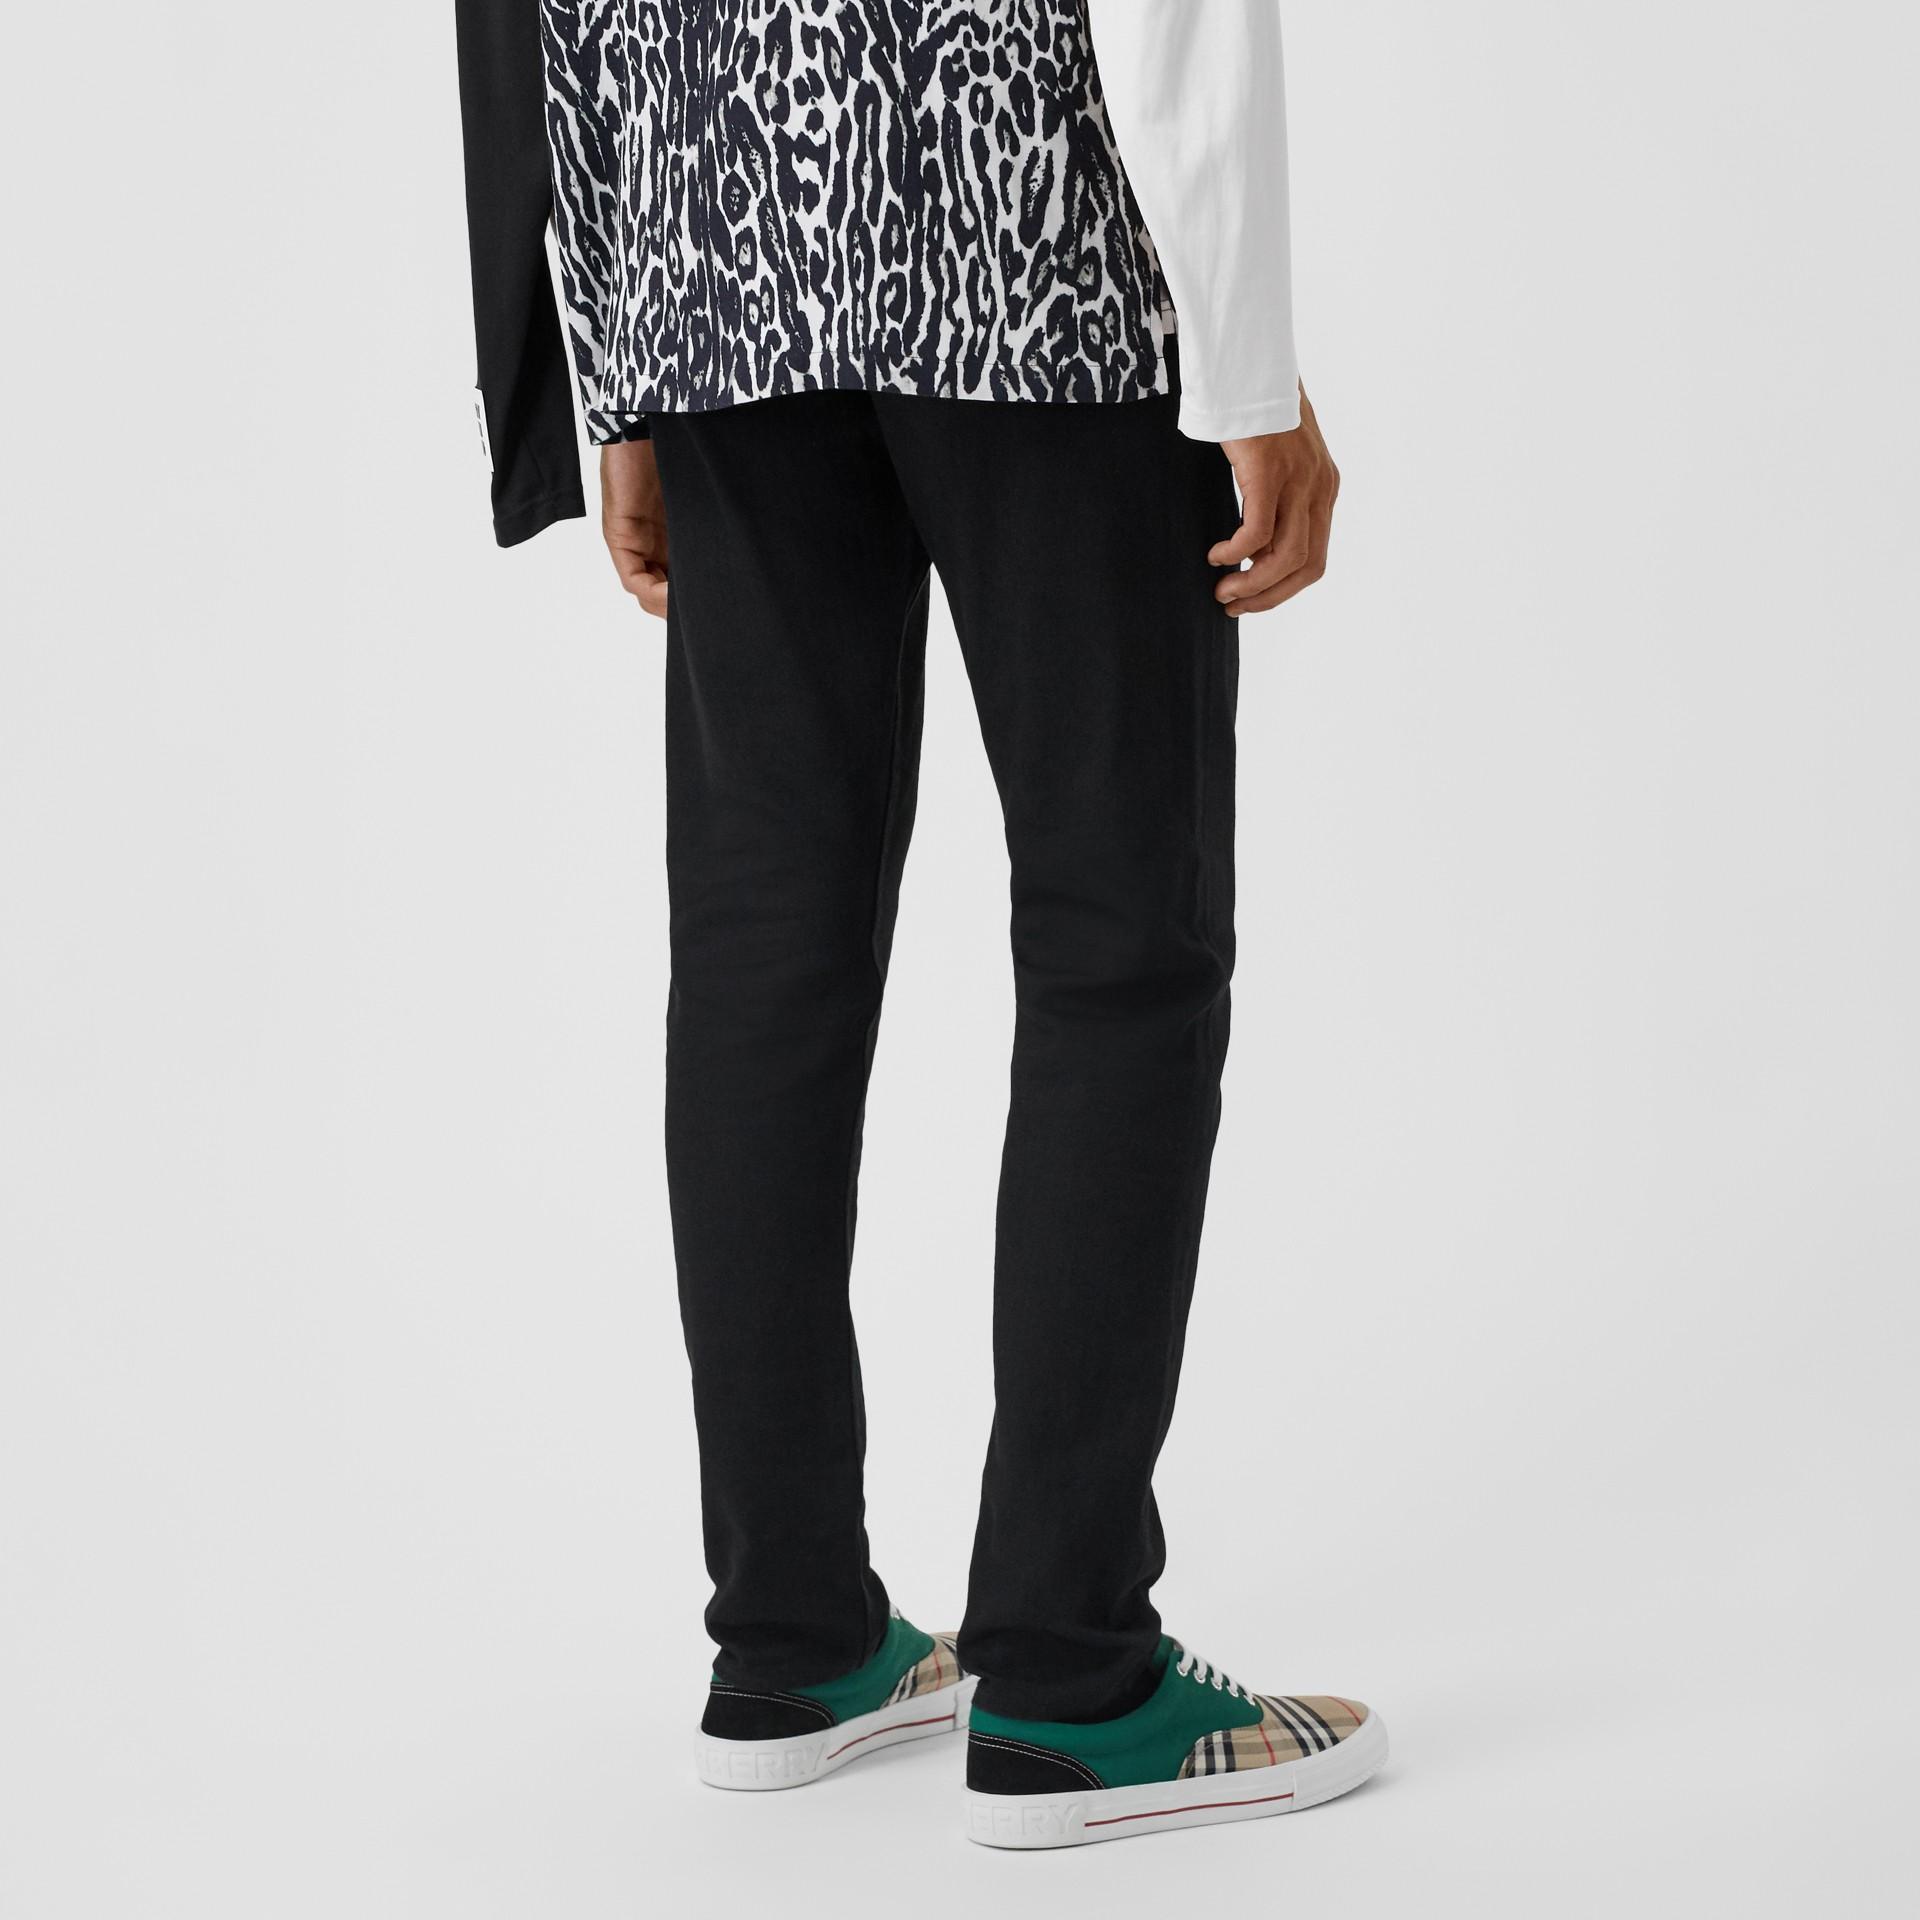 Slim Fit Japanese Denim Jeans in Black - Men | Burberry - gallery image 2